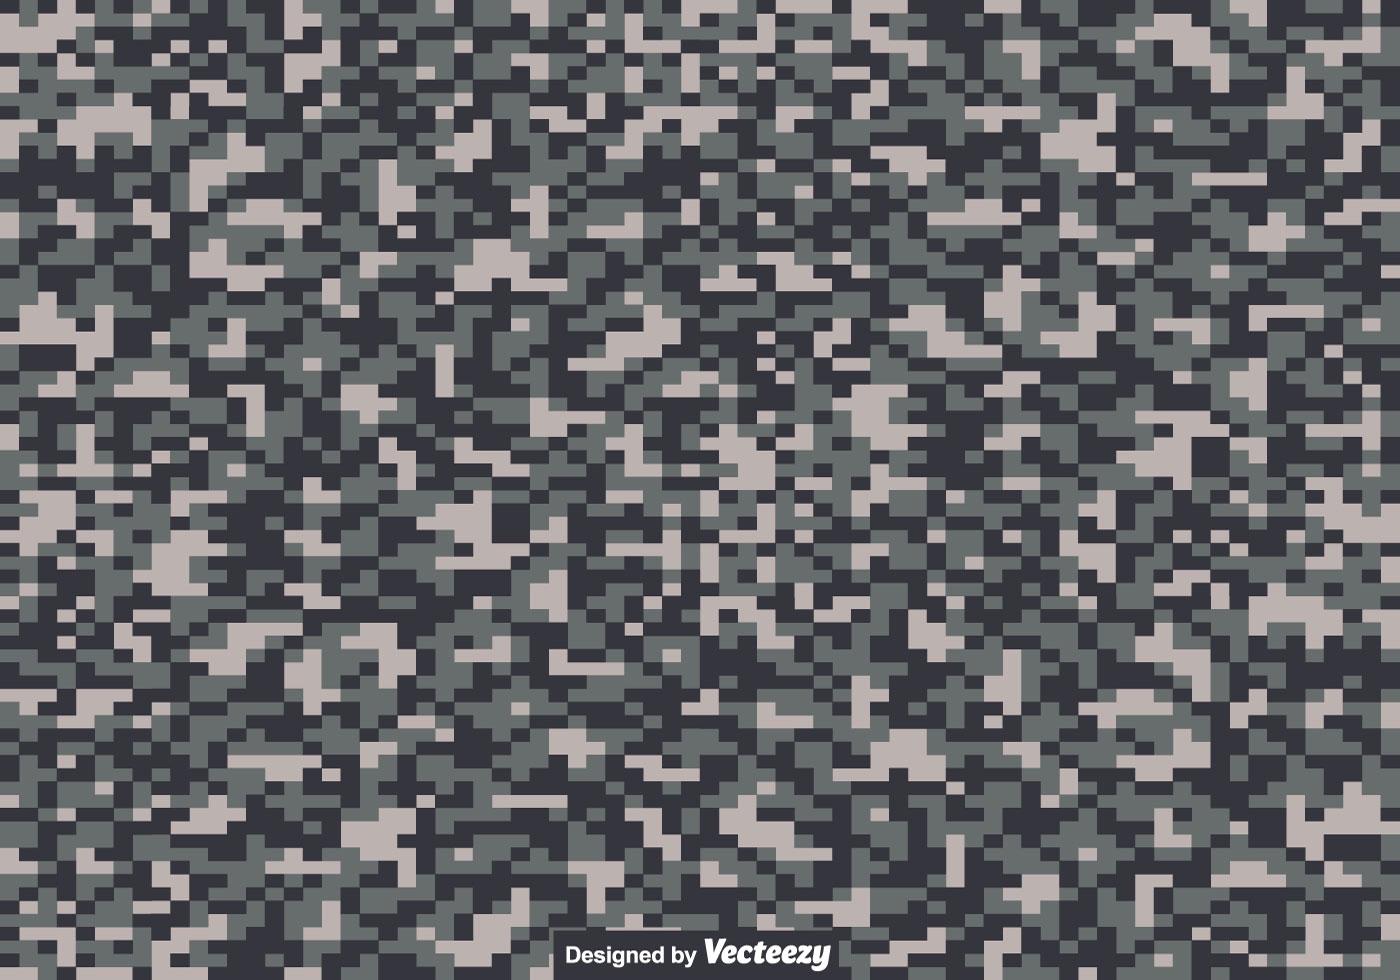 Digital Camouflage Texture - Vector - Download Free Vector